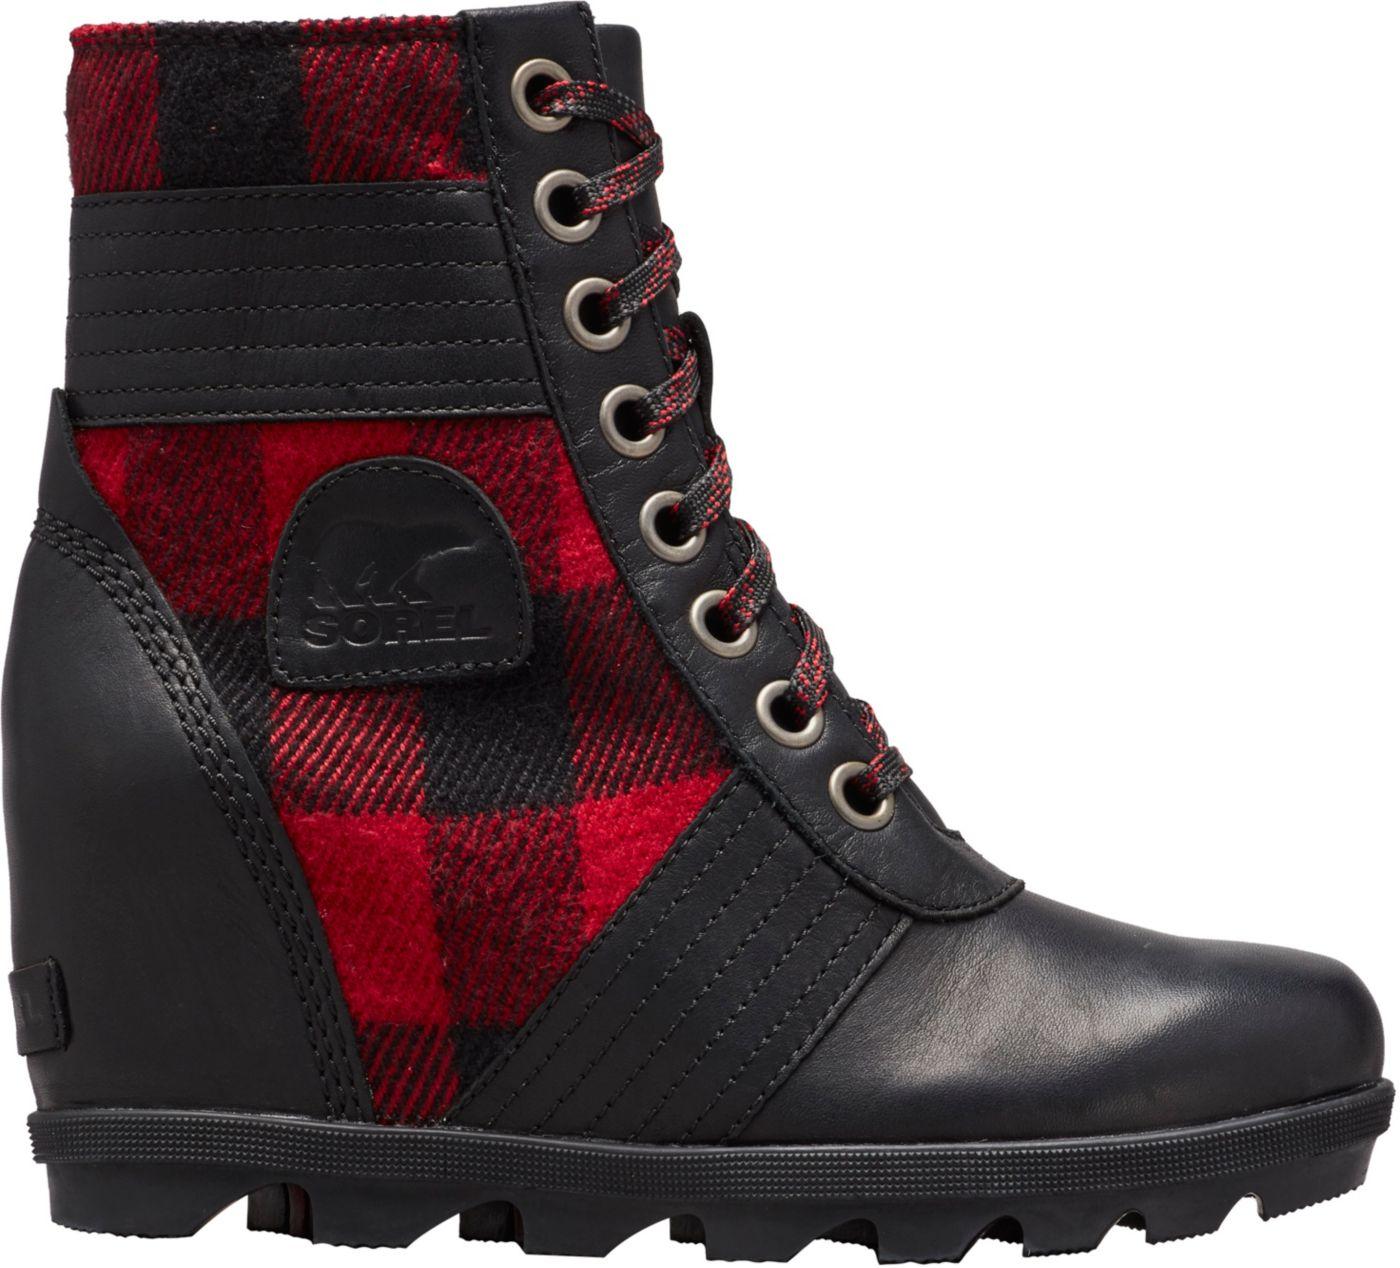 SOREL Women's Lexie Wedge Plaid Casual Boots